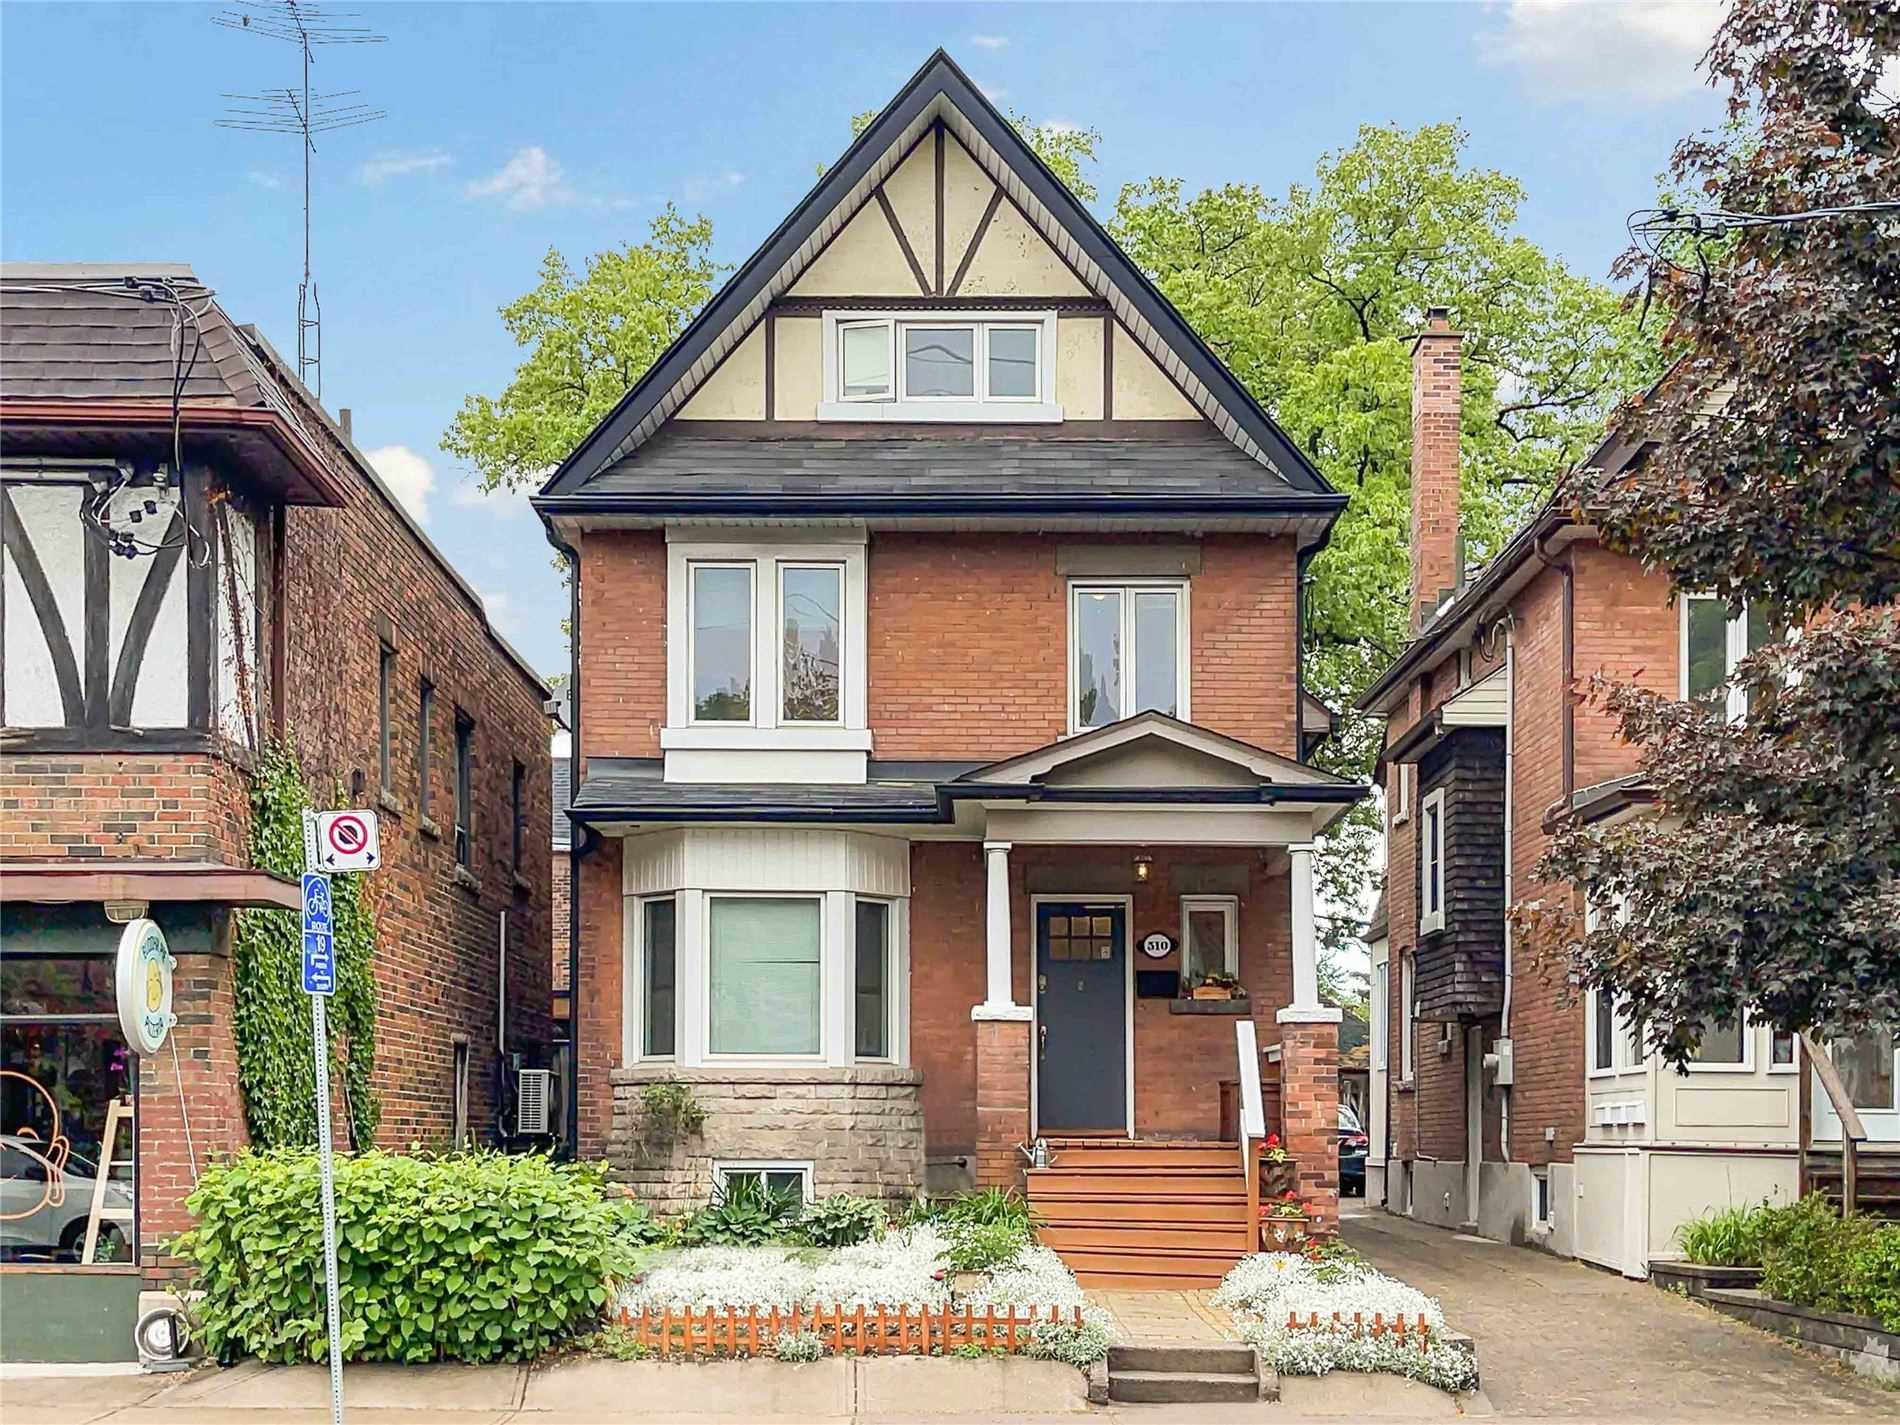 House For Sale 510 Annette St, M6P1S3, Junction Area, Toronto